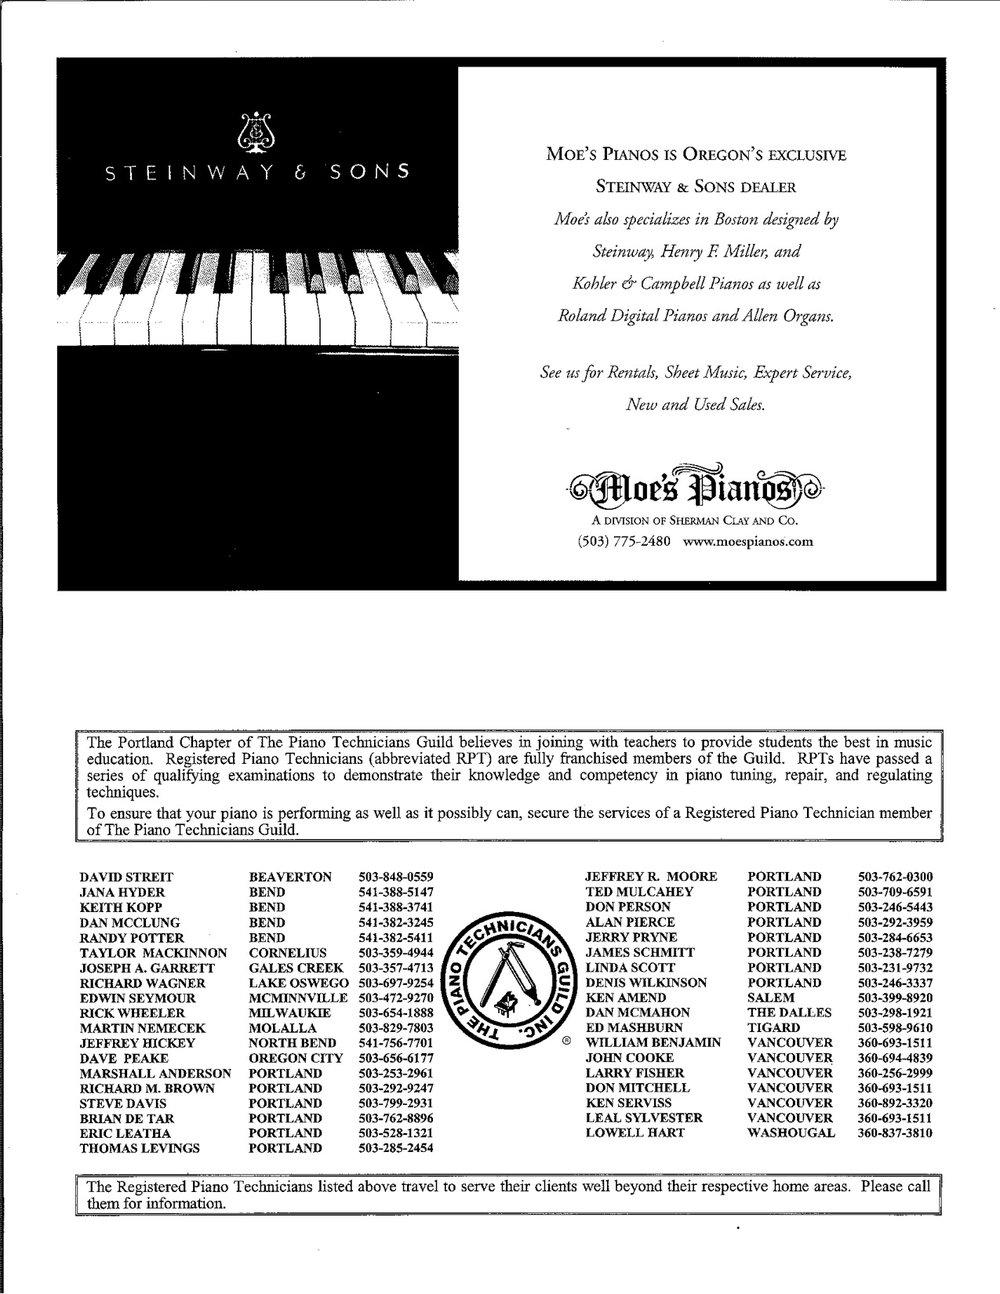 Bronfman02-03_Program12.jpg